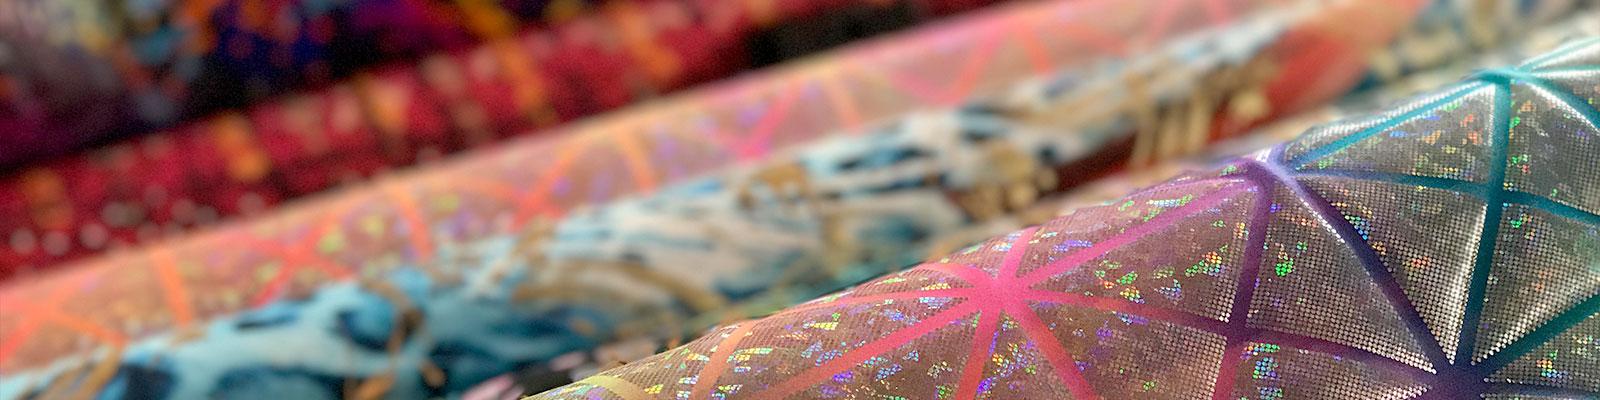 fabric-background